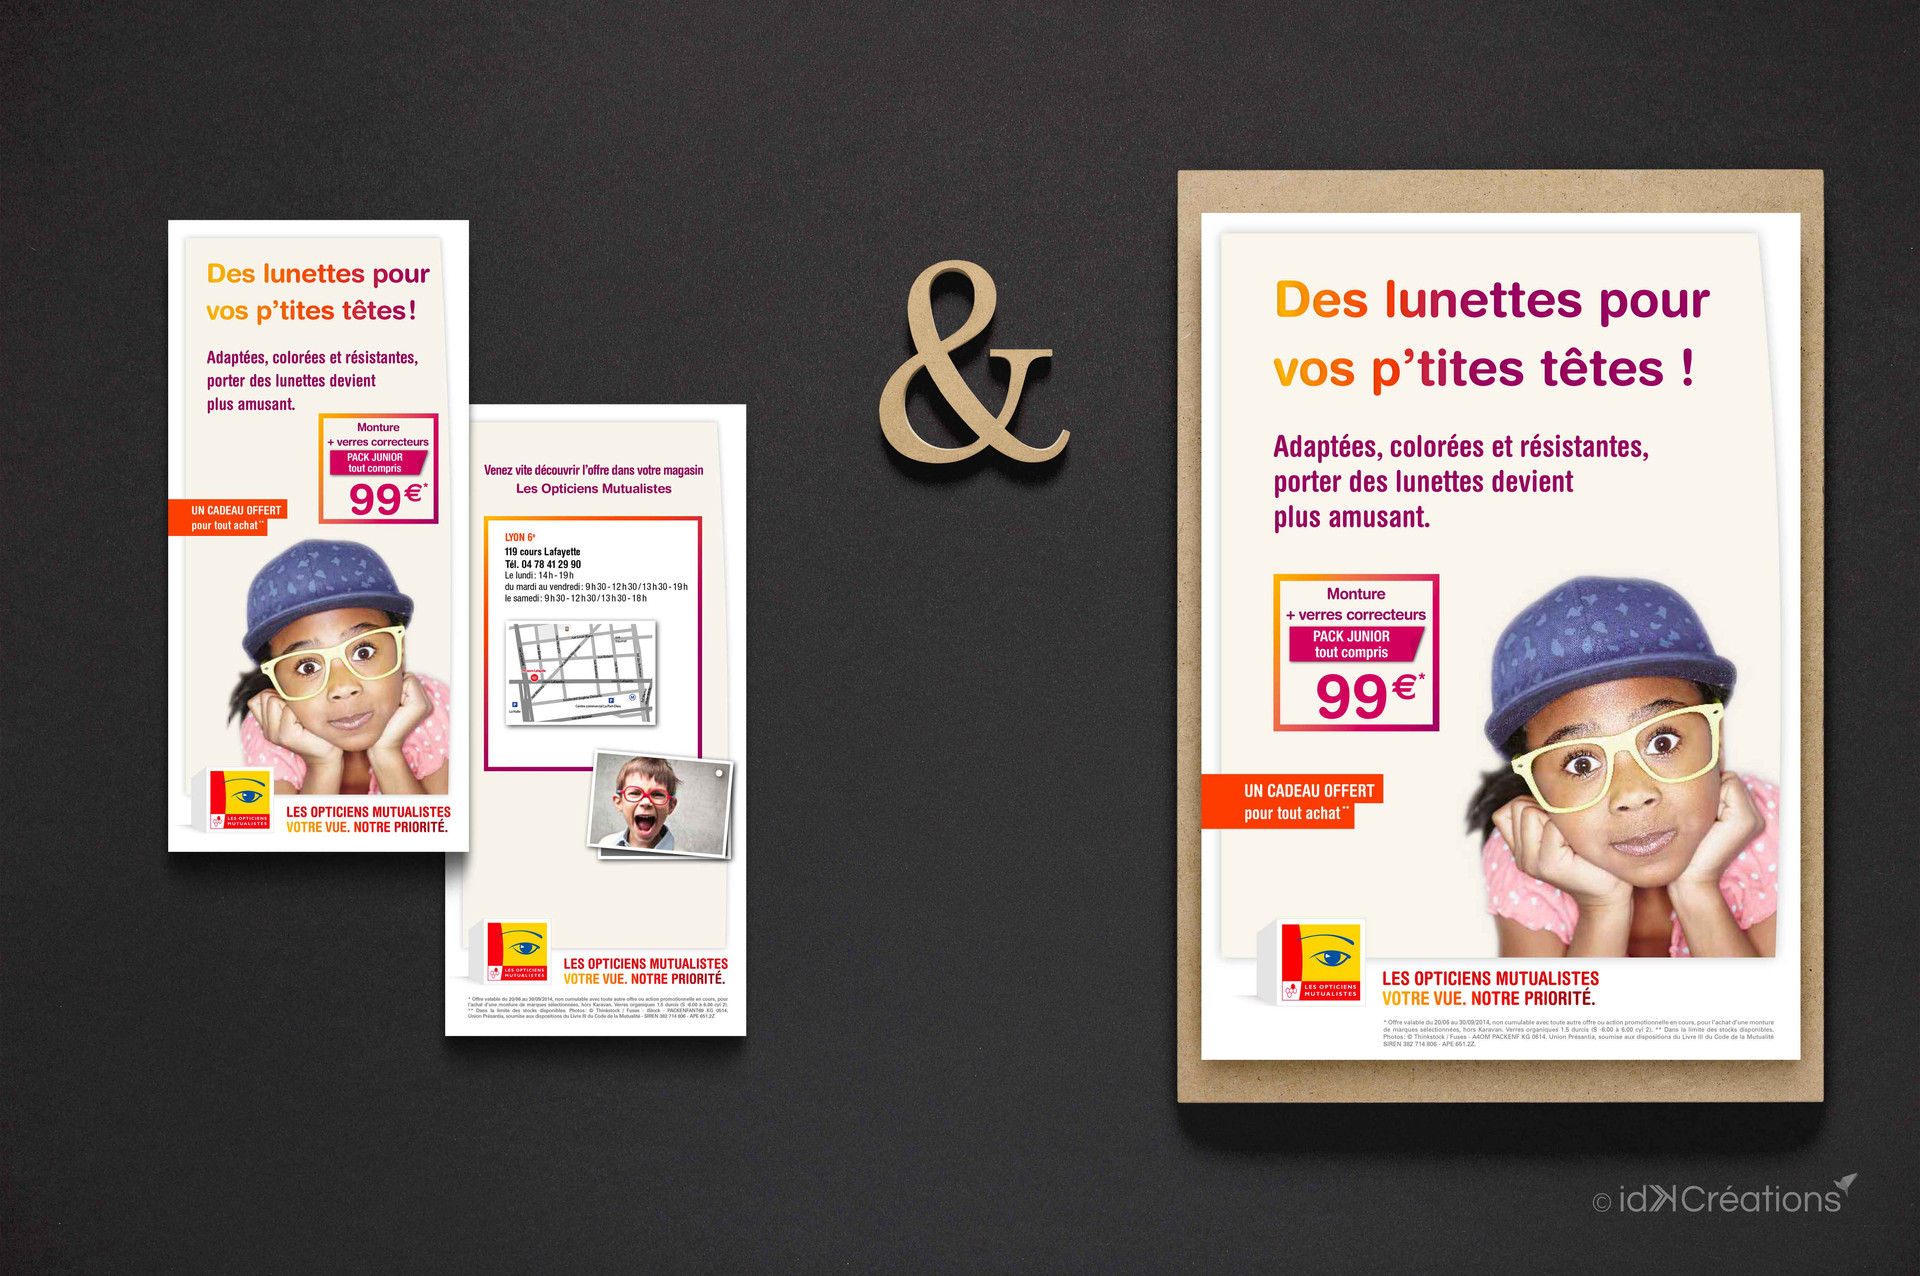 Campagne marketing Les Opticiens Mutualistes